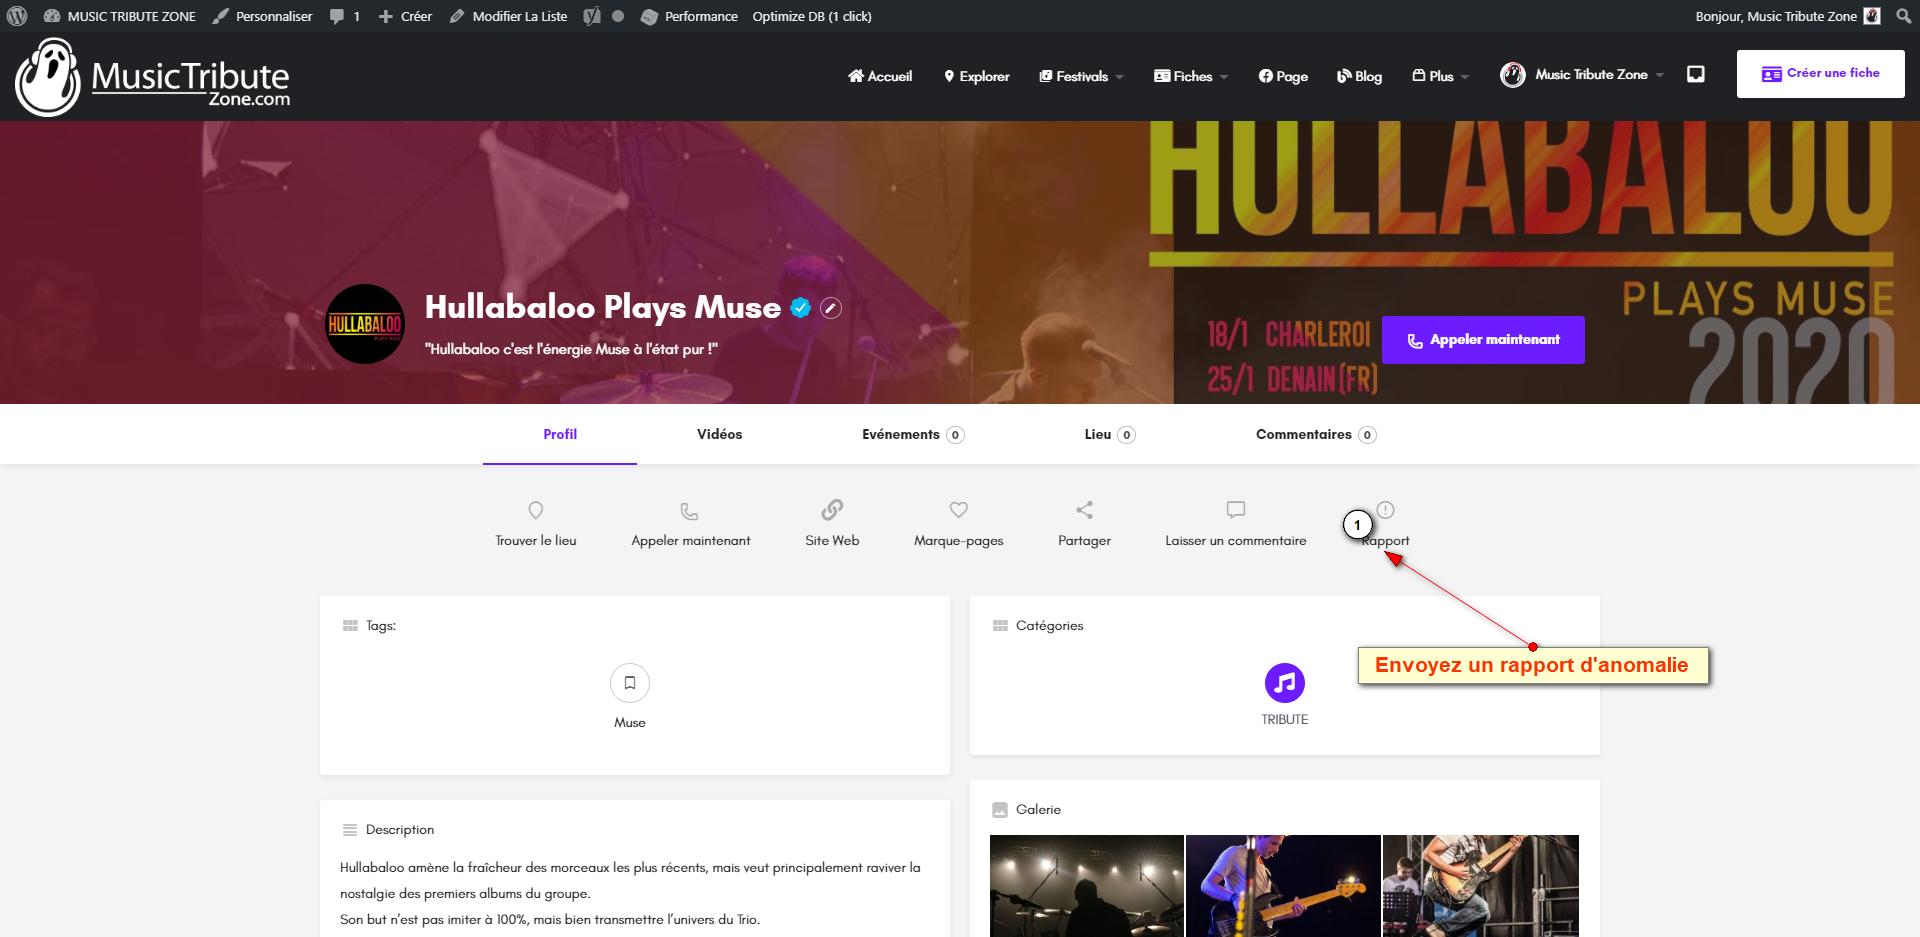 FireShot Pro Screen Capture #016 - 'Hullabaloo Plays Muse I MUSIC TRIBUTE ZONE' - music-tribute-zone_com